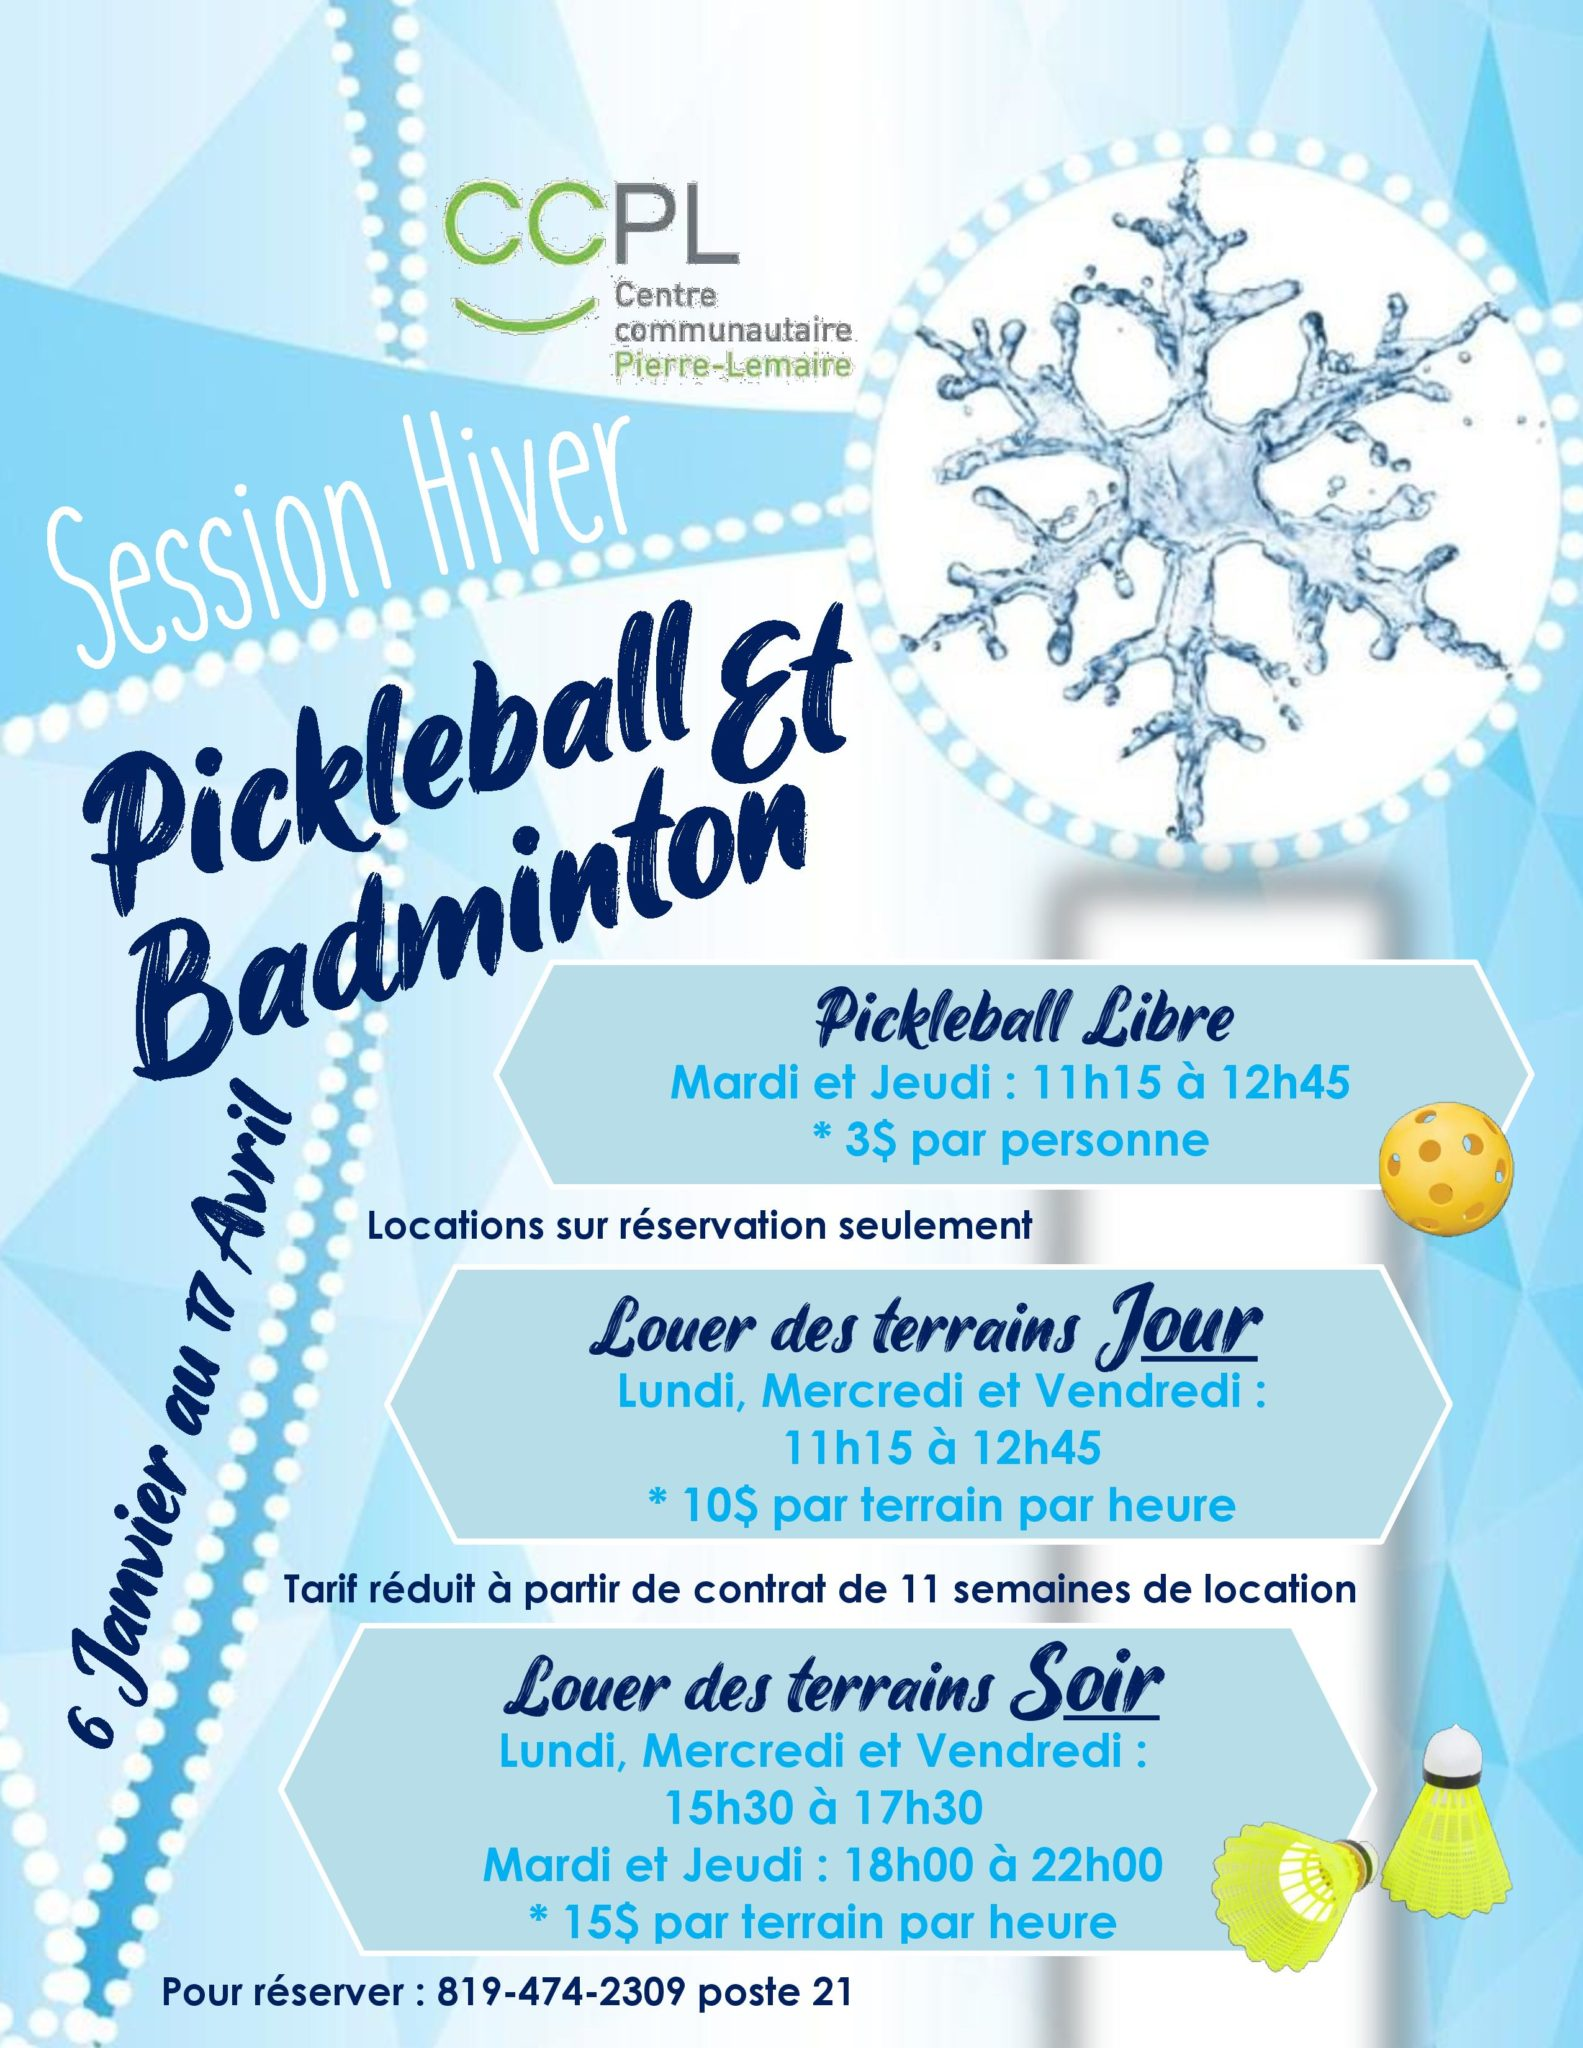 Pickleball / Badminton